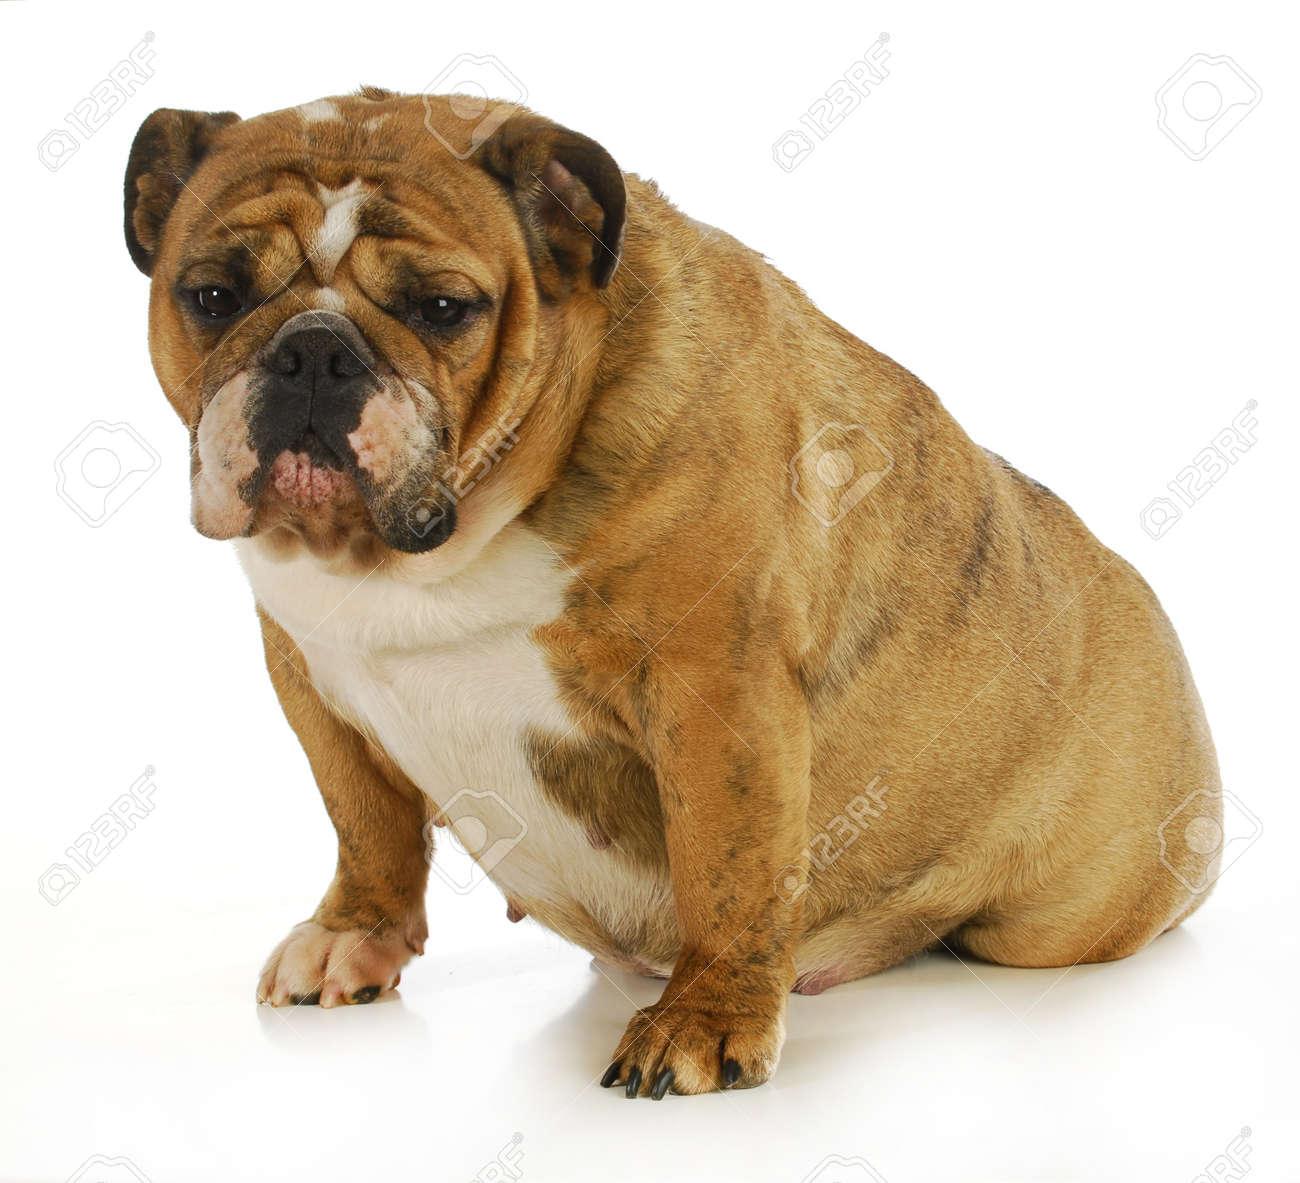 pregnant dog - english bulldog 6 weeks gestation (3 weeks to